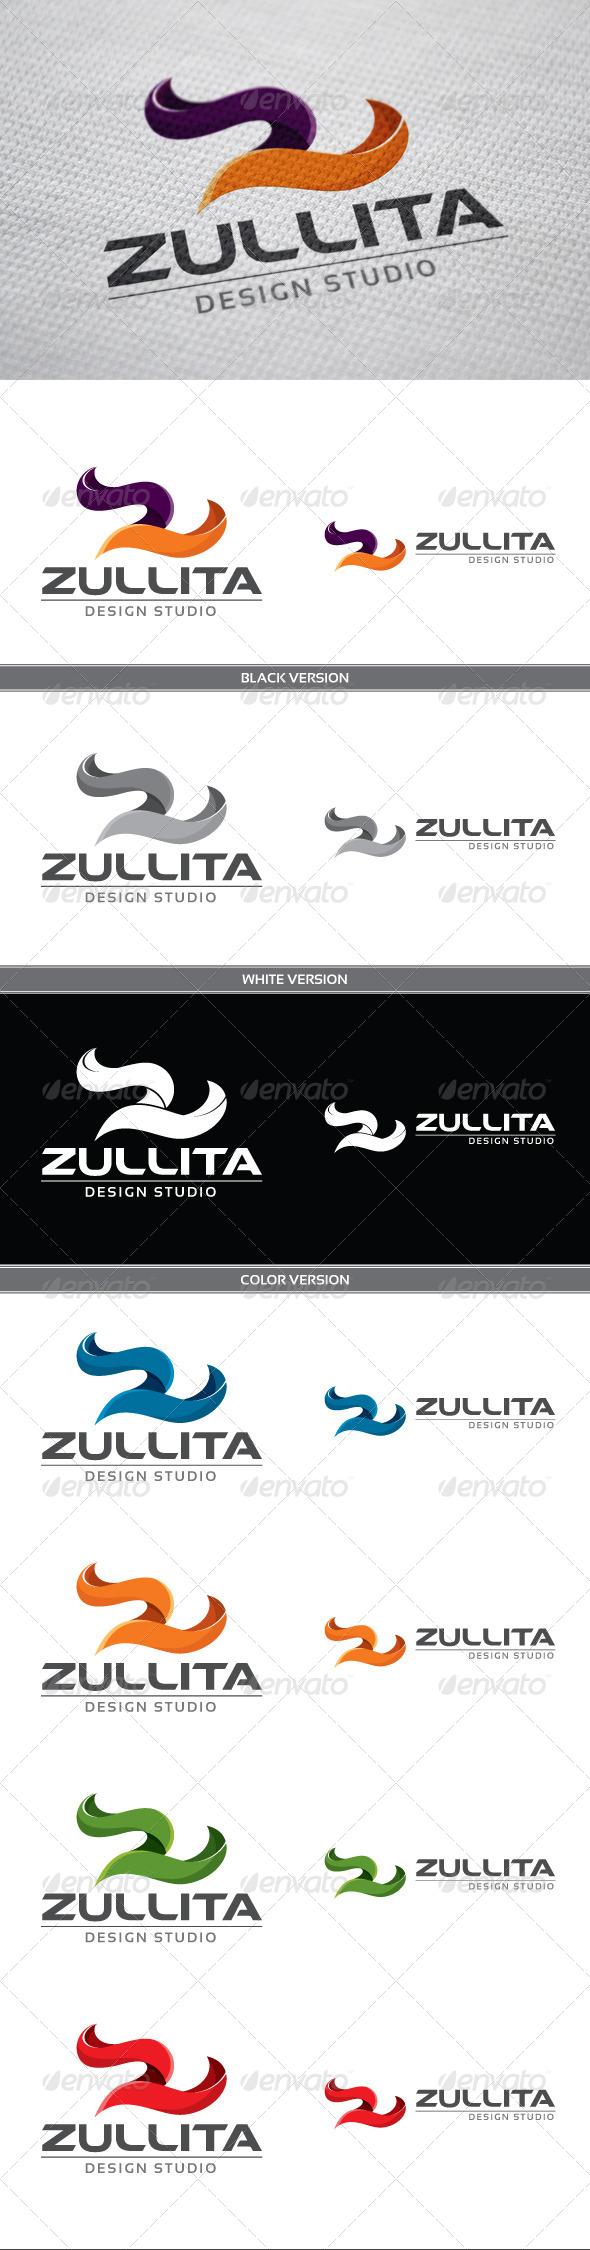 Zullita - Letters Logo Templates